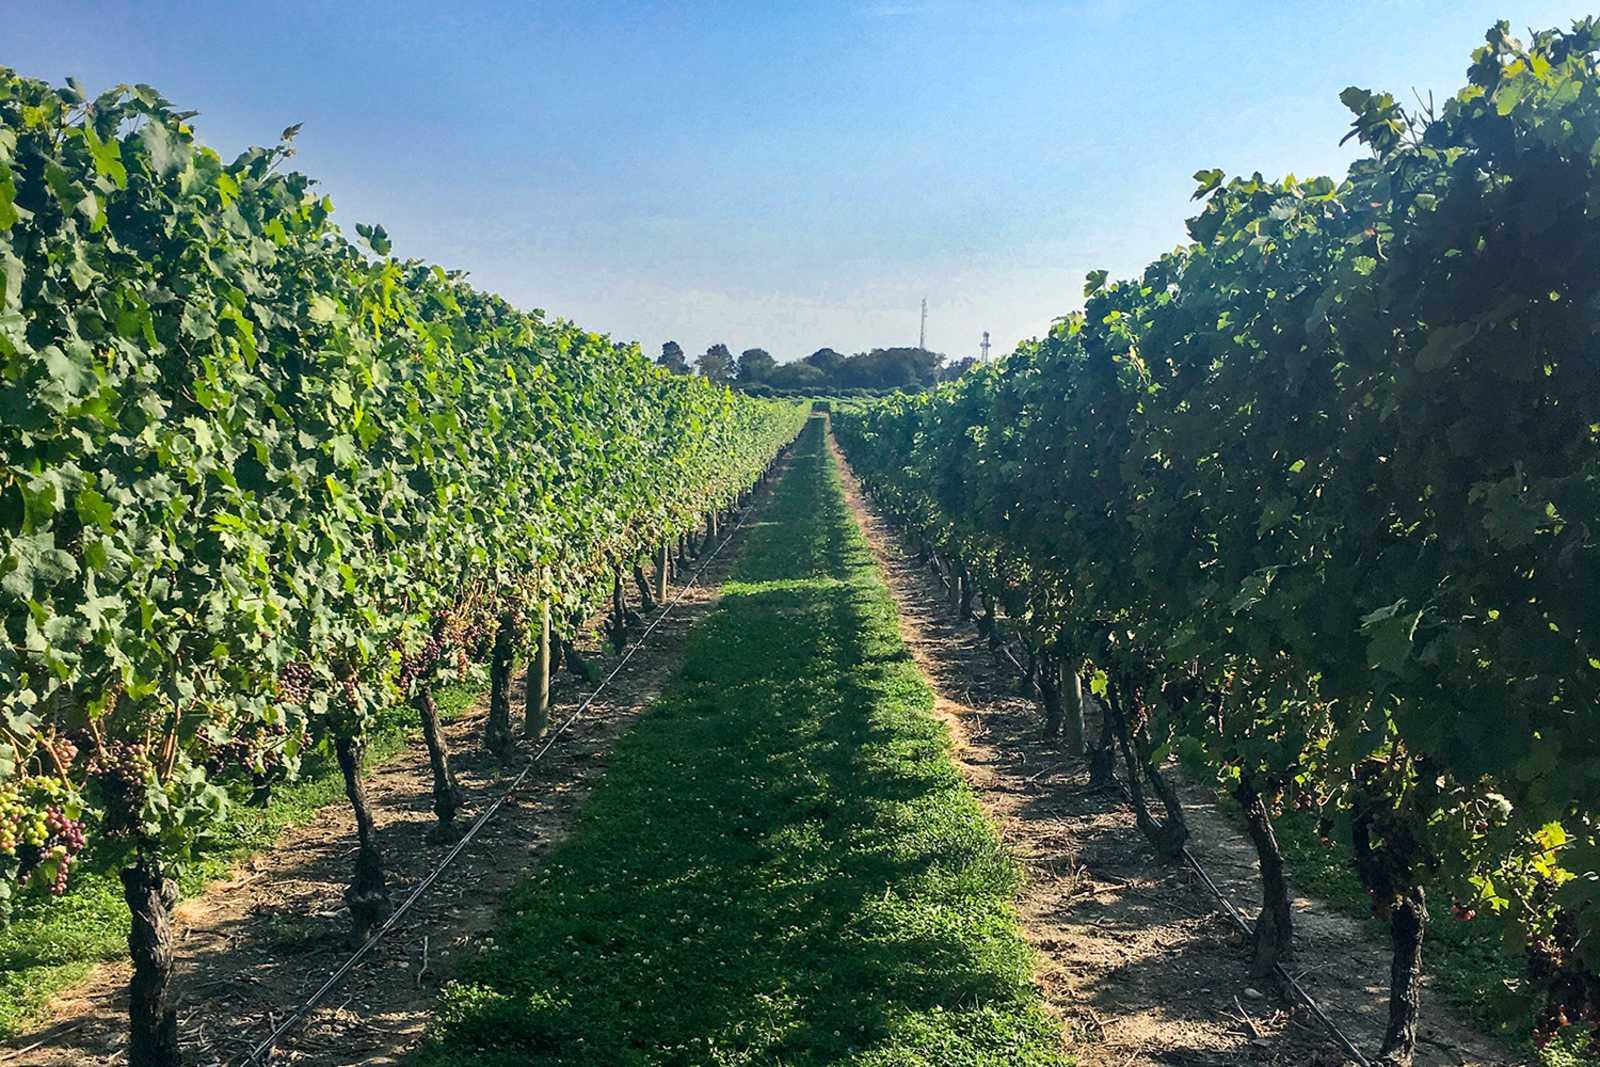 Die Weinkellerei Newport Vineyards